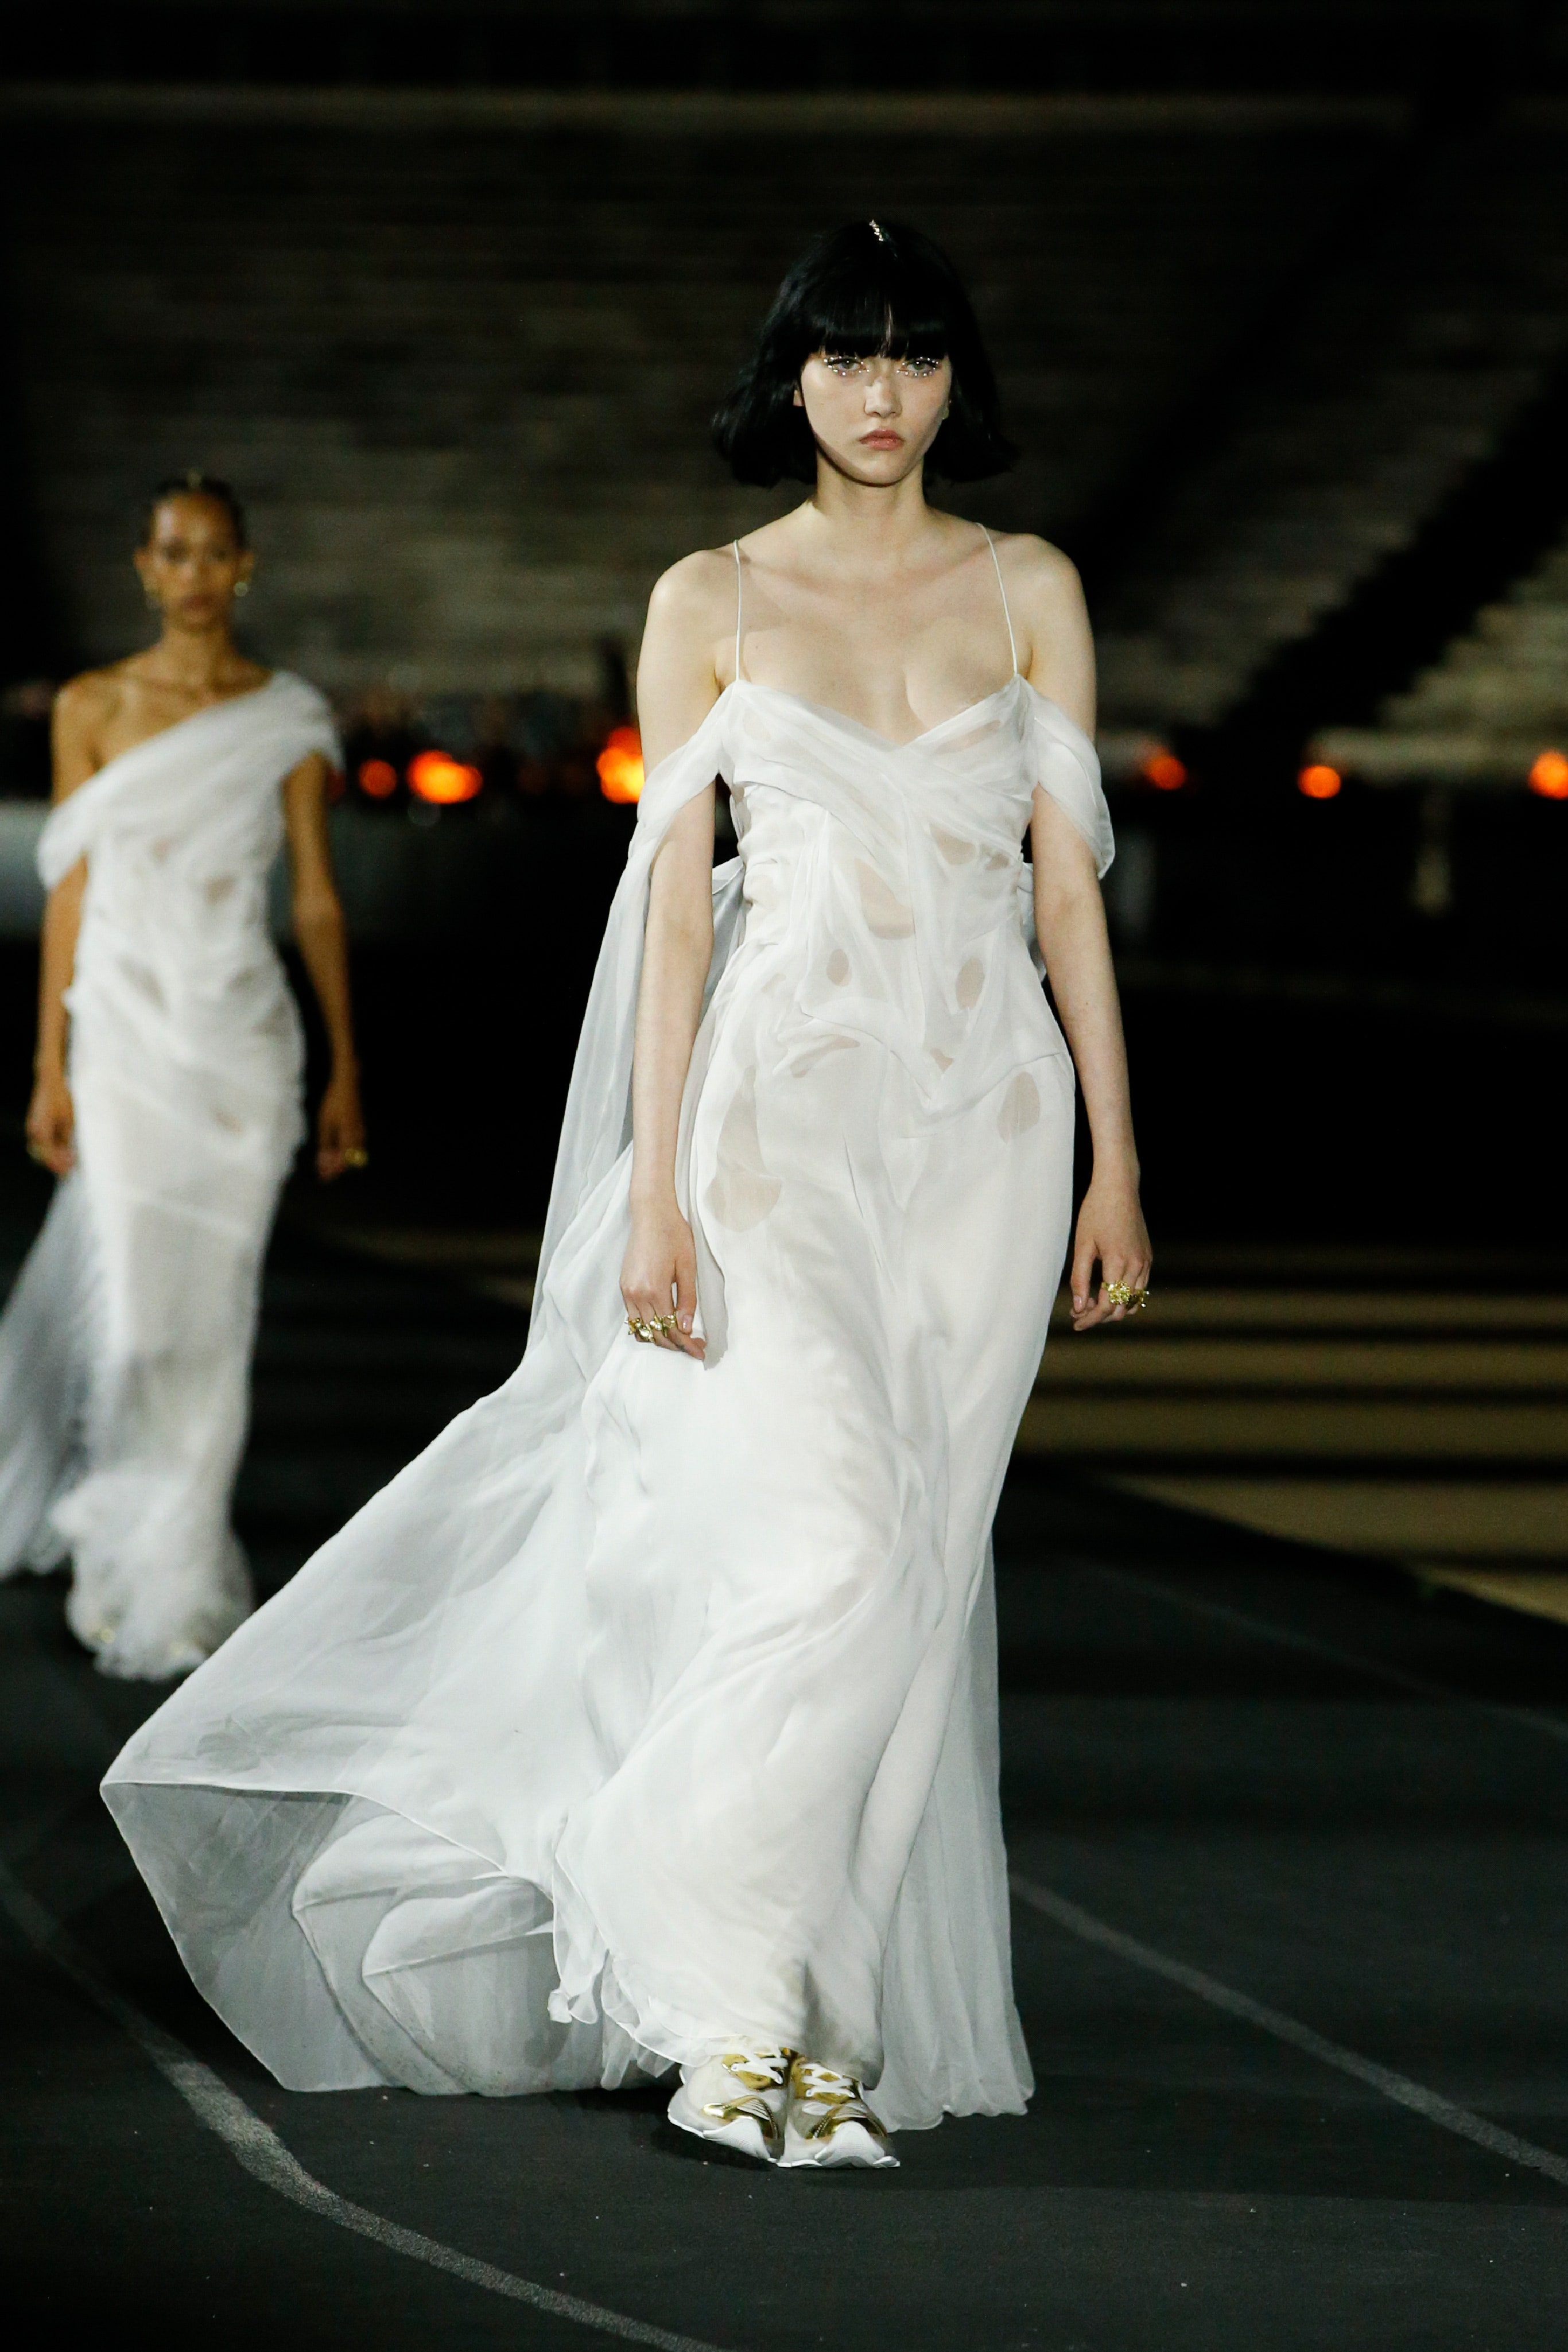 00089-Dior-Resort-2022-credit-brand.jpeg